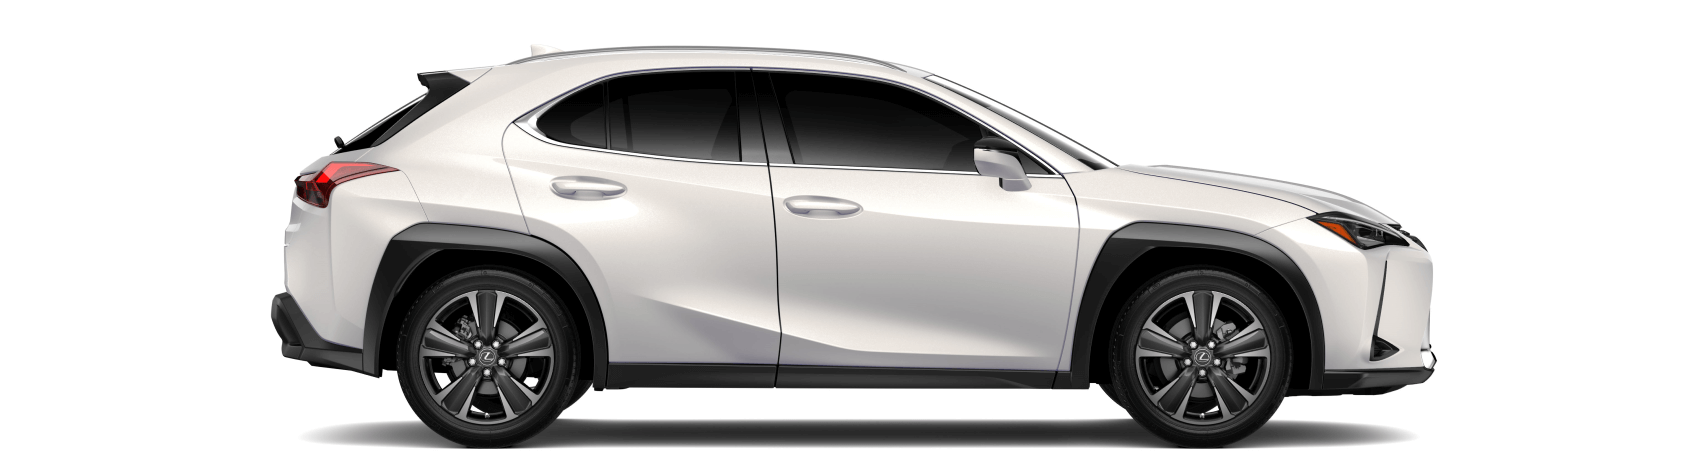 2021 Lexus UX Hybrid White